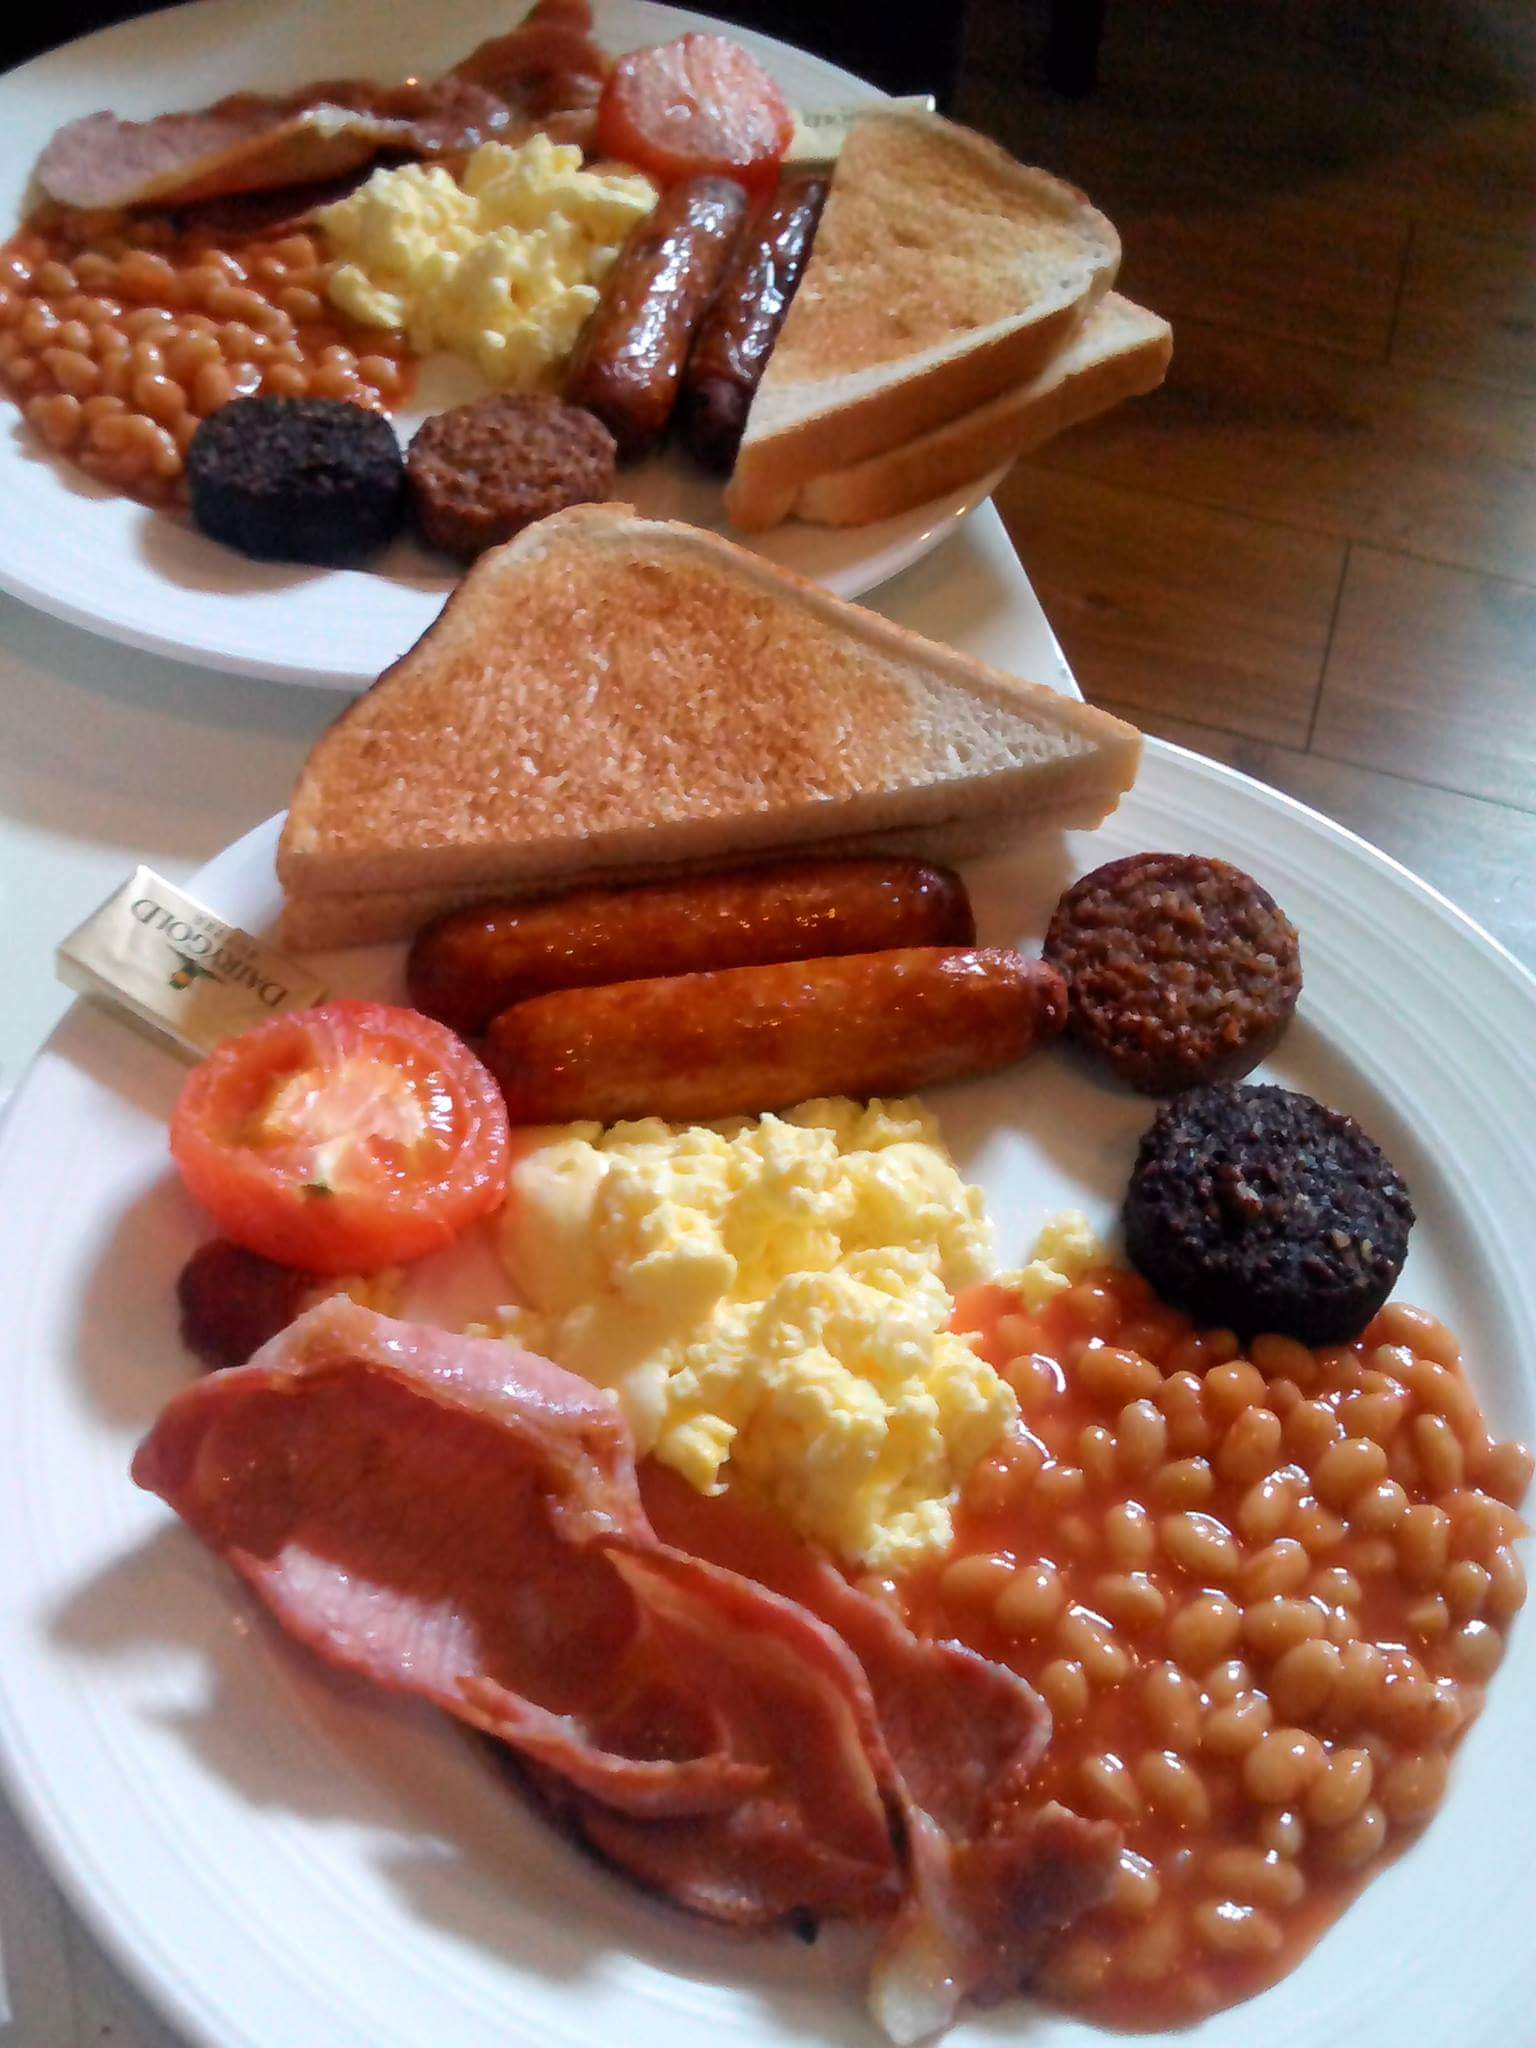 Image of 愛爾蘭美食愛爾蘭早餐 Full Irish Breakfast in Ireland